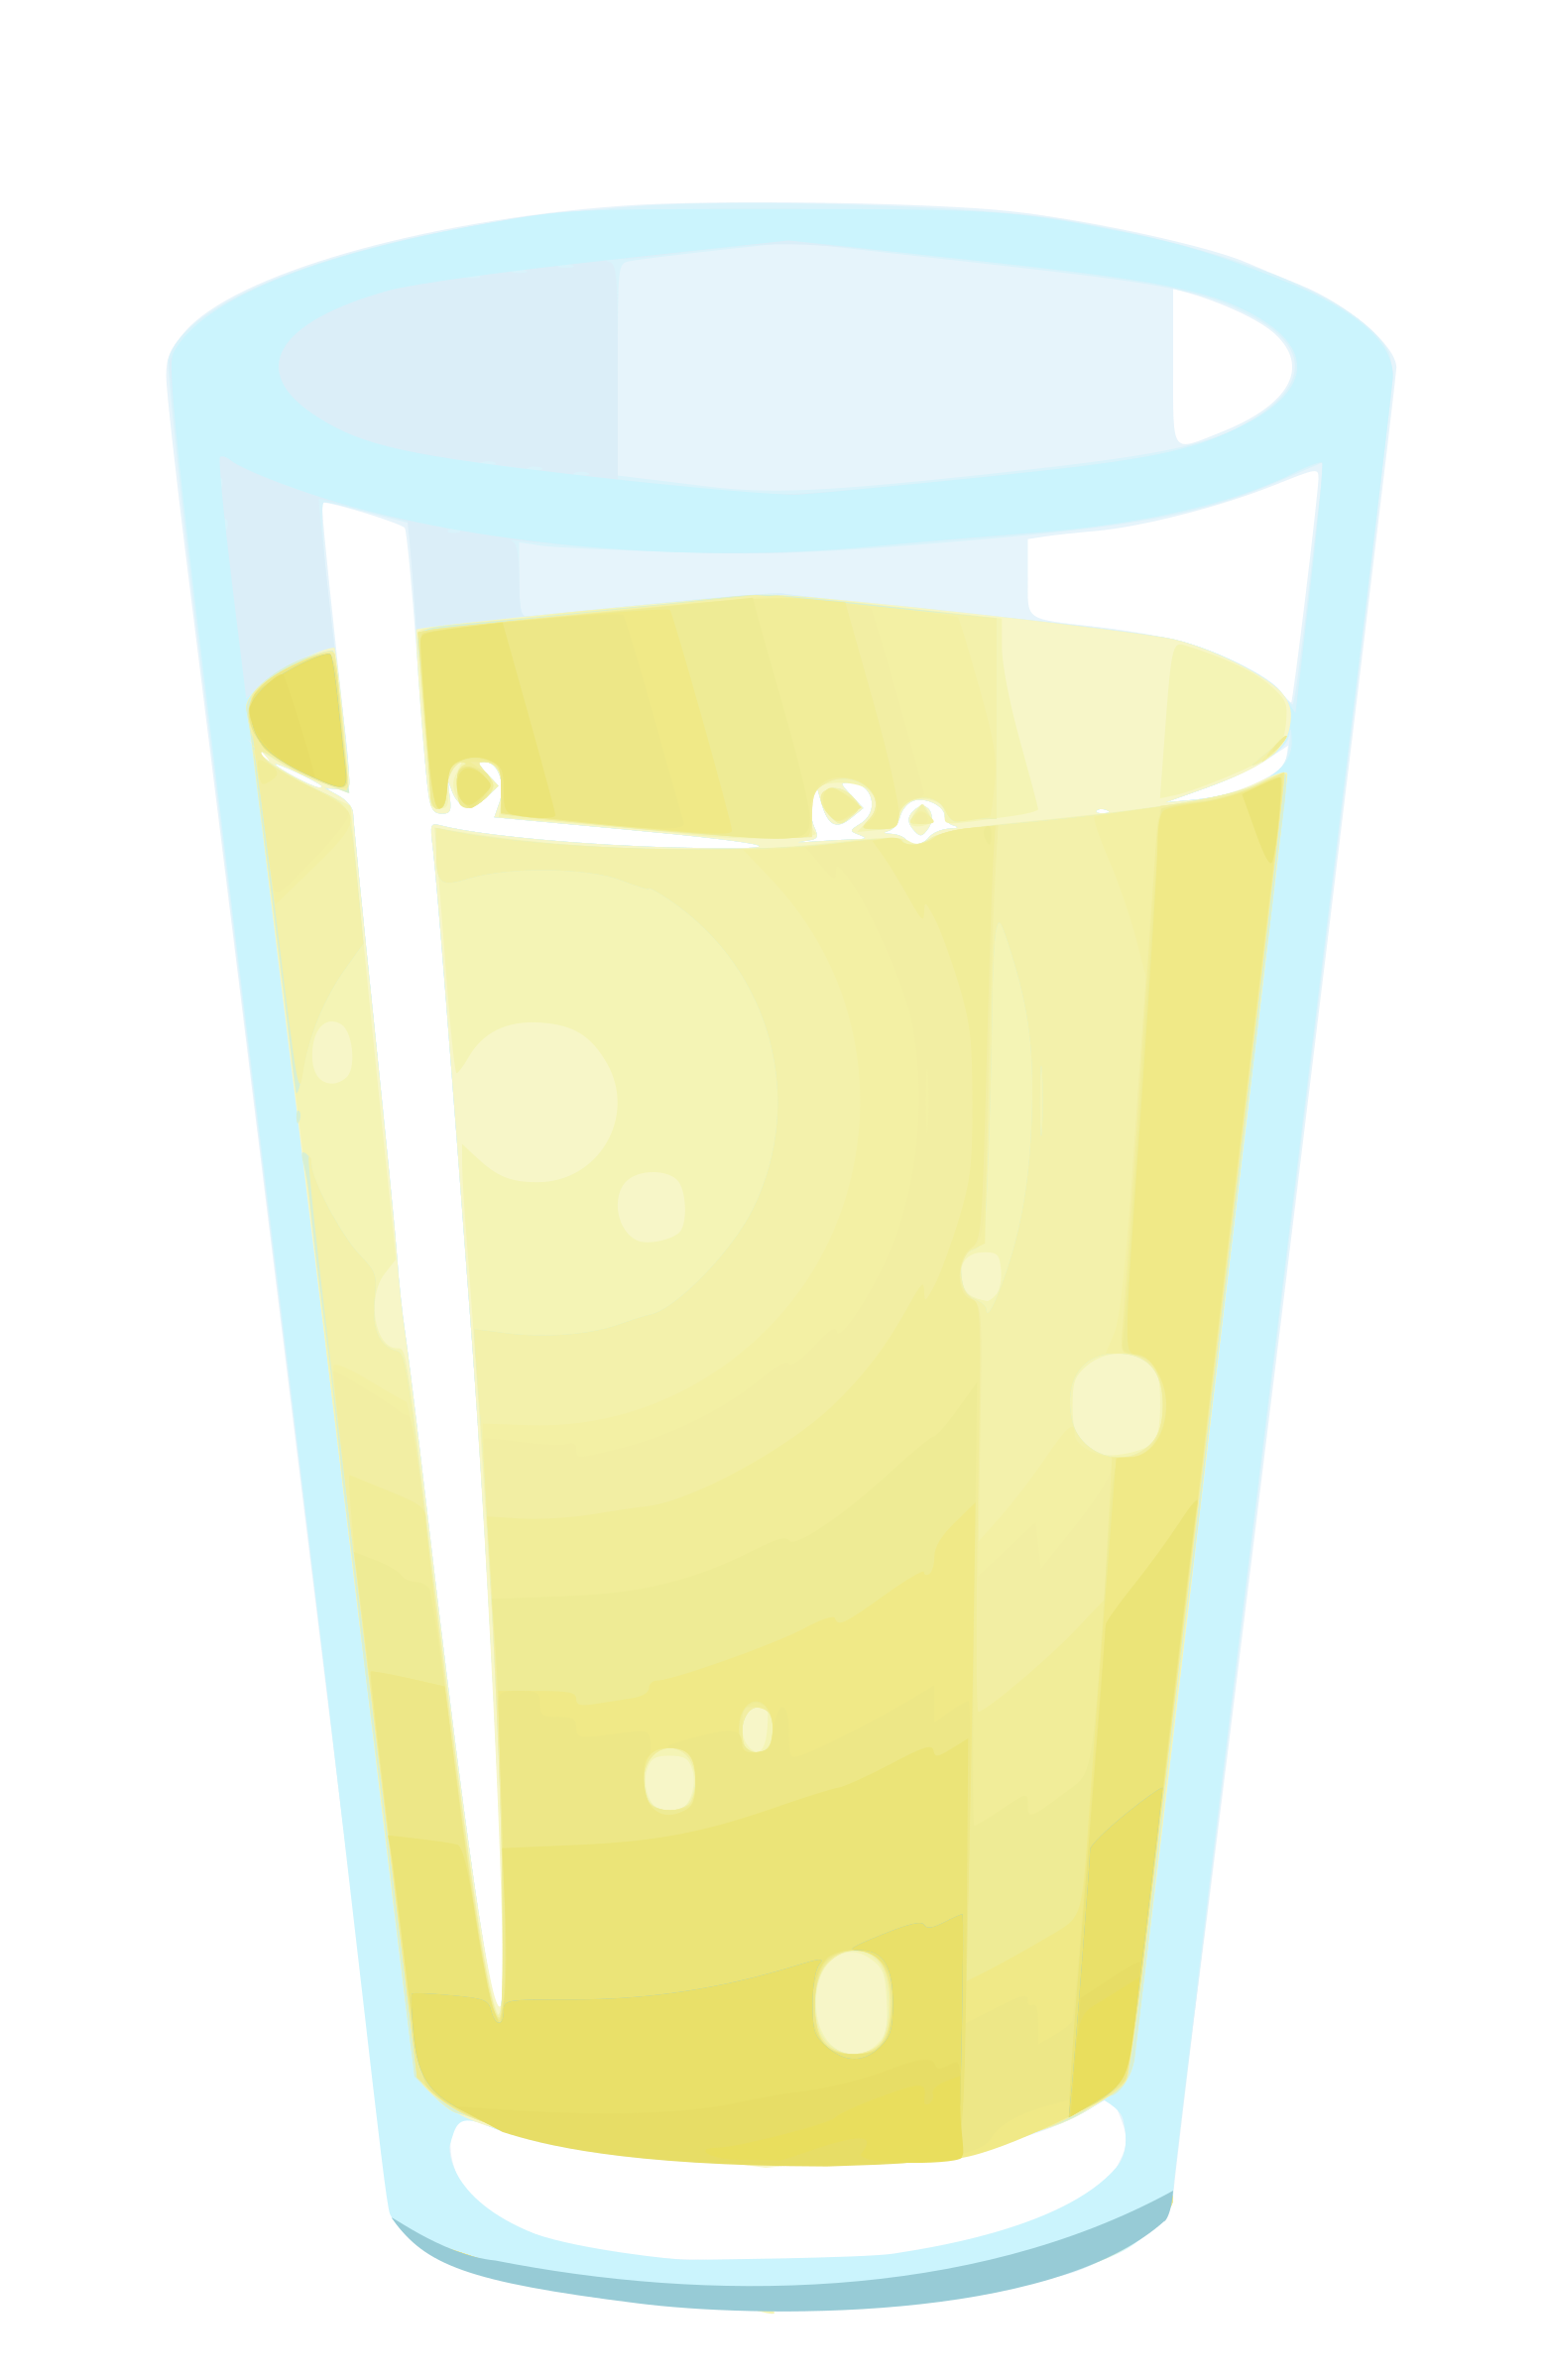 Glass clipart lemon. Juice glitch big image